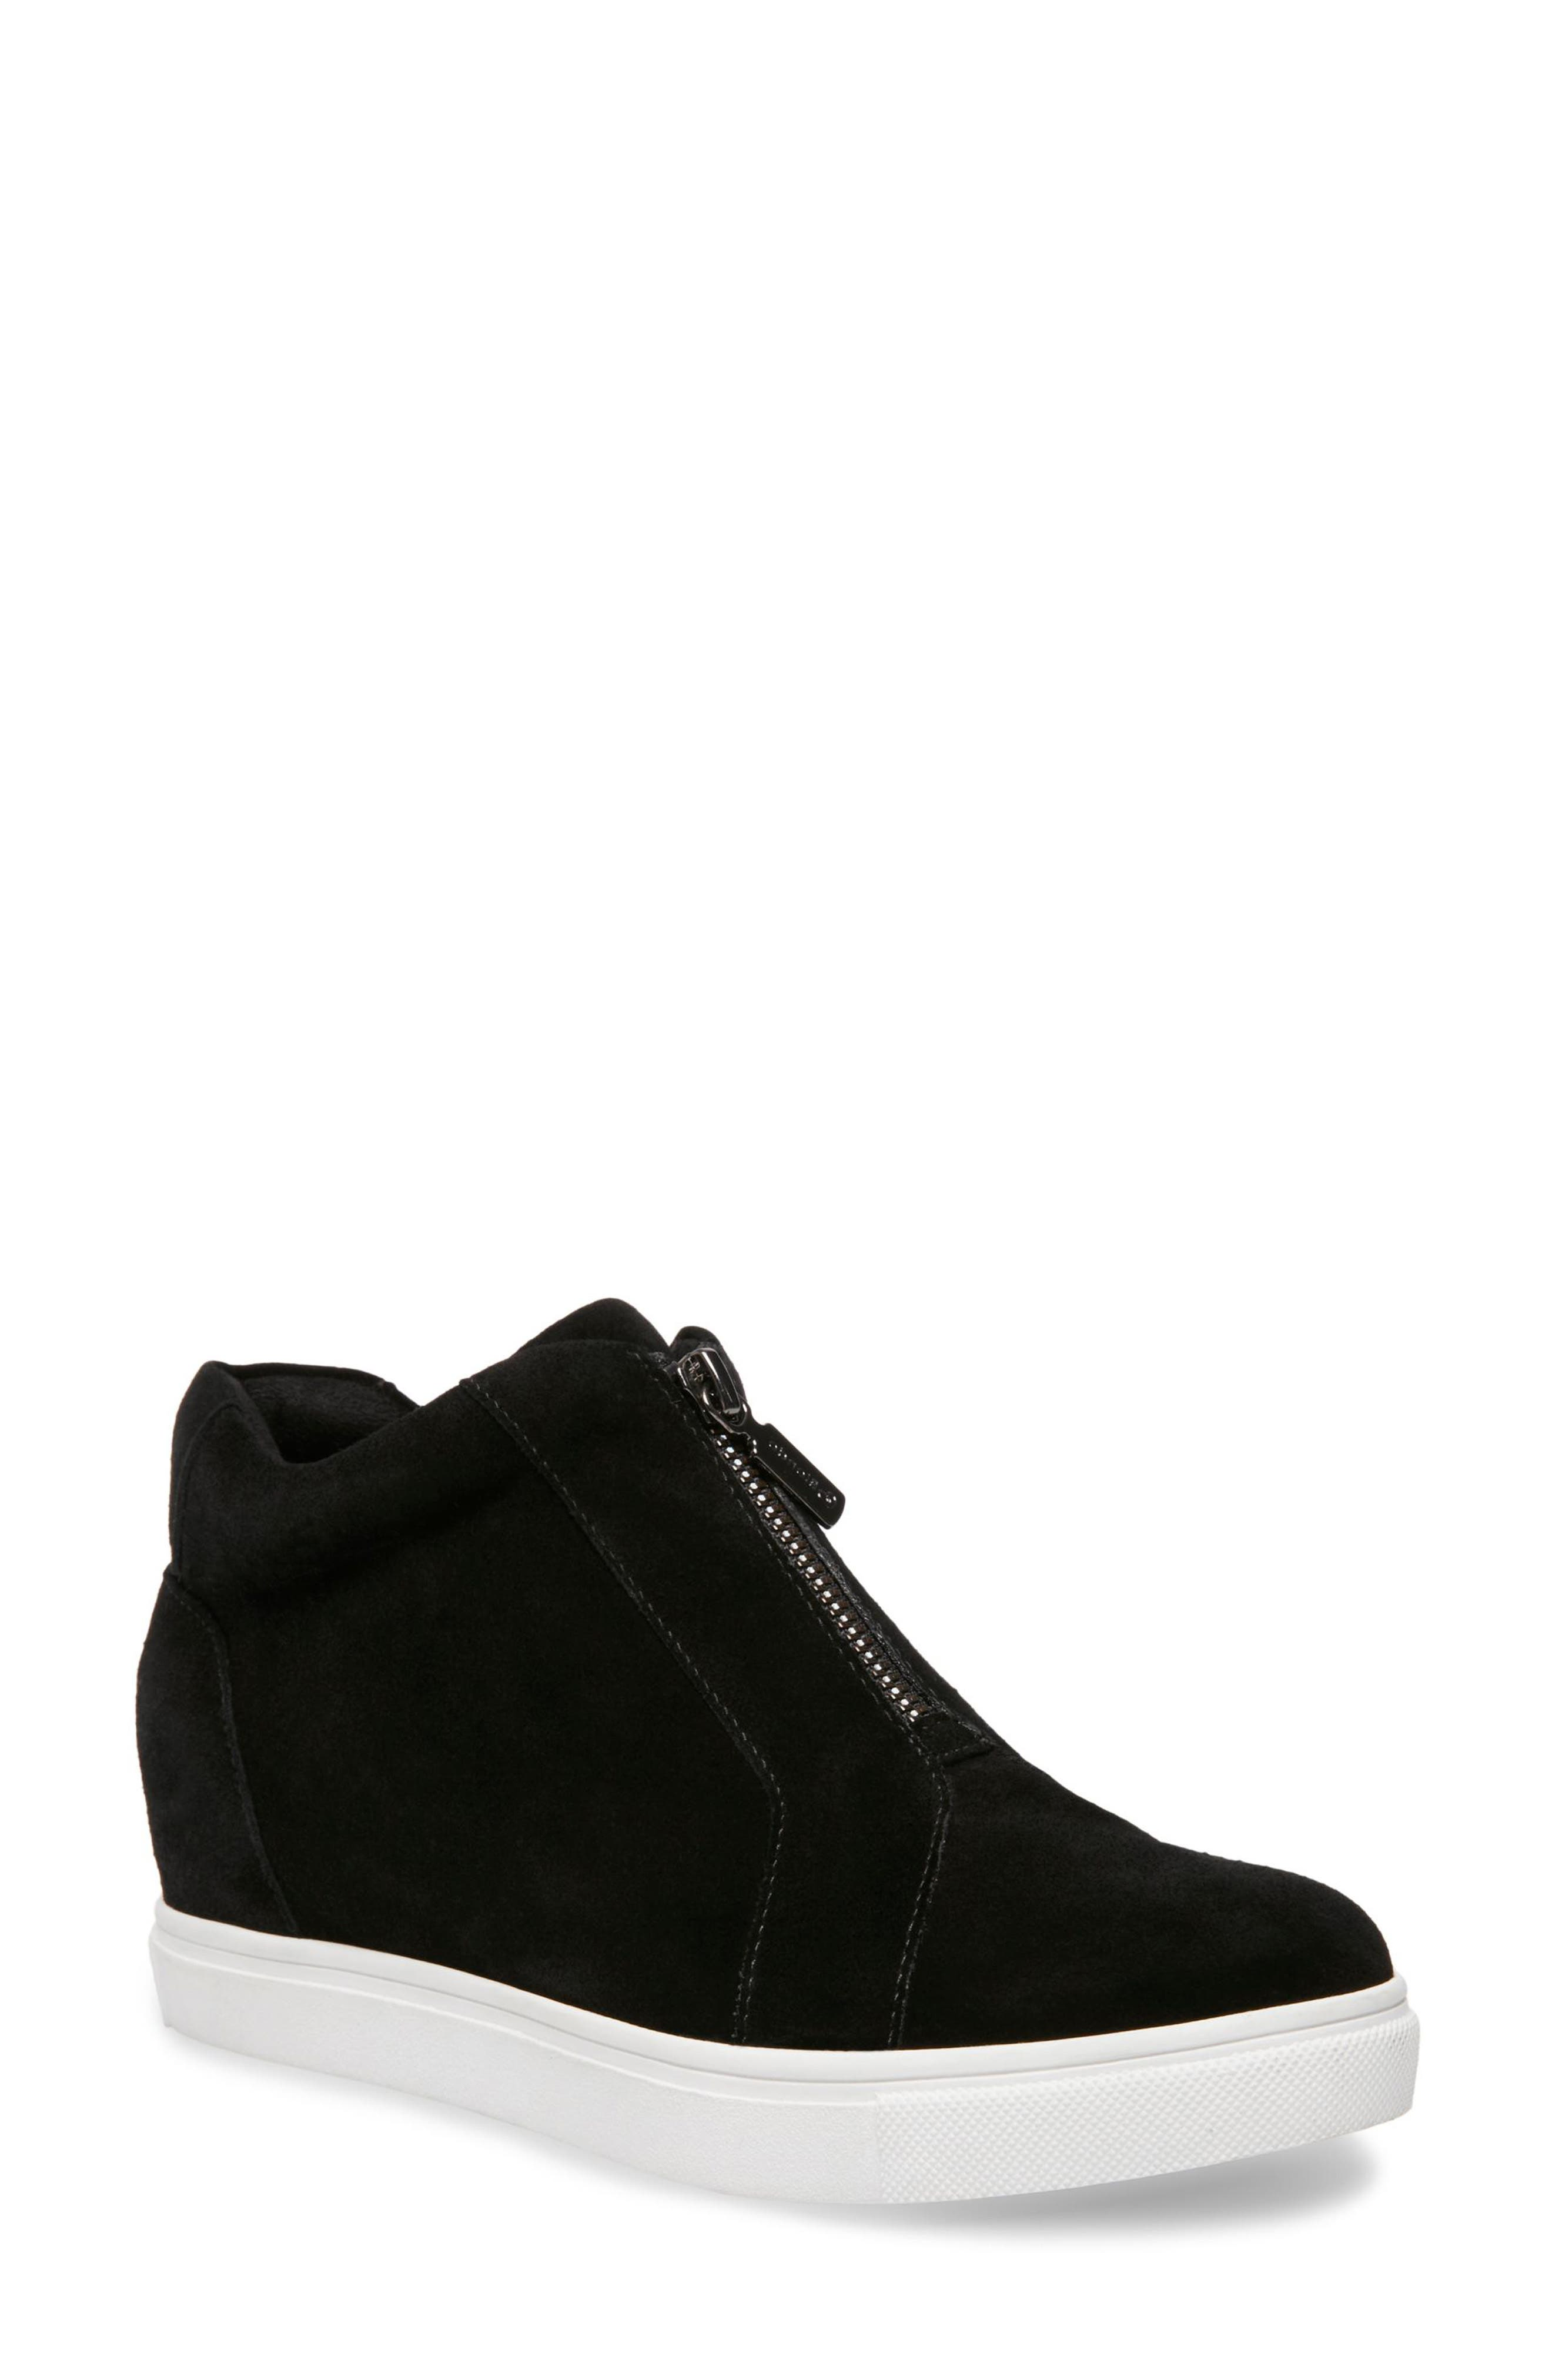 Glenda Waterproof Sneaker Bootie, Main, color, BLACK SUEDE